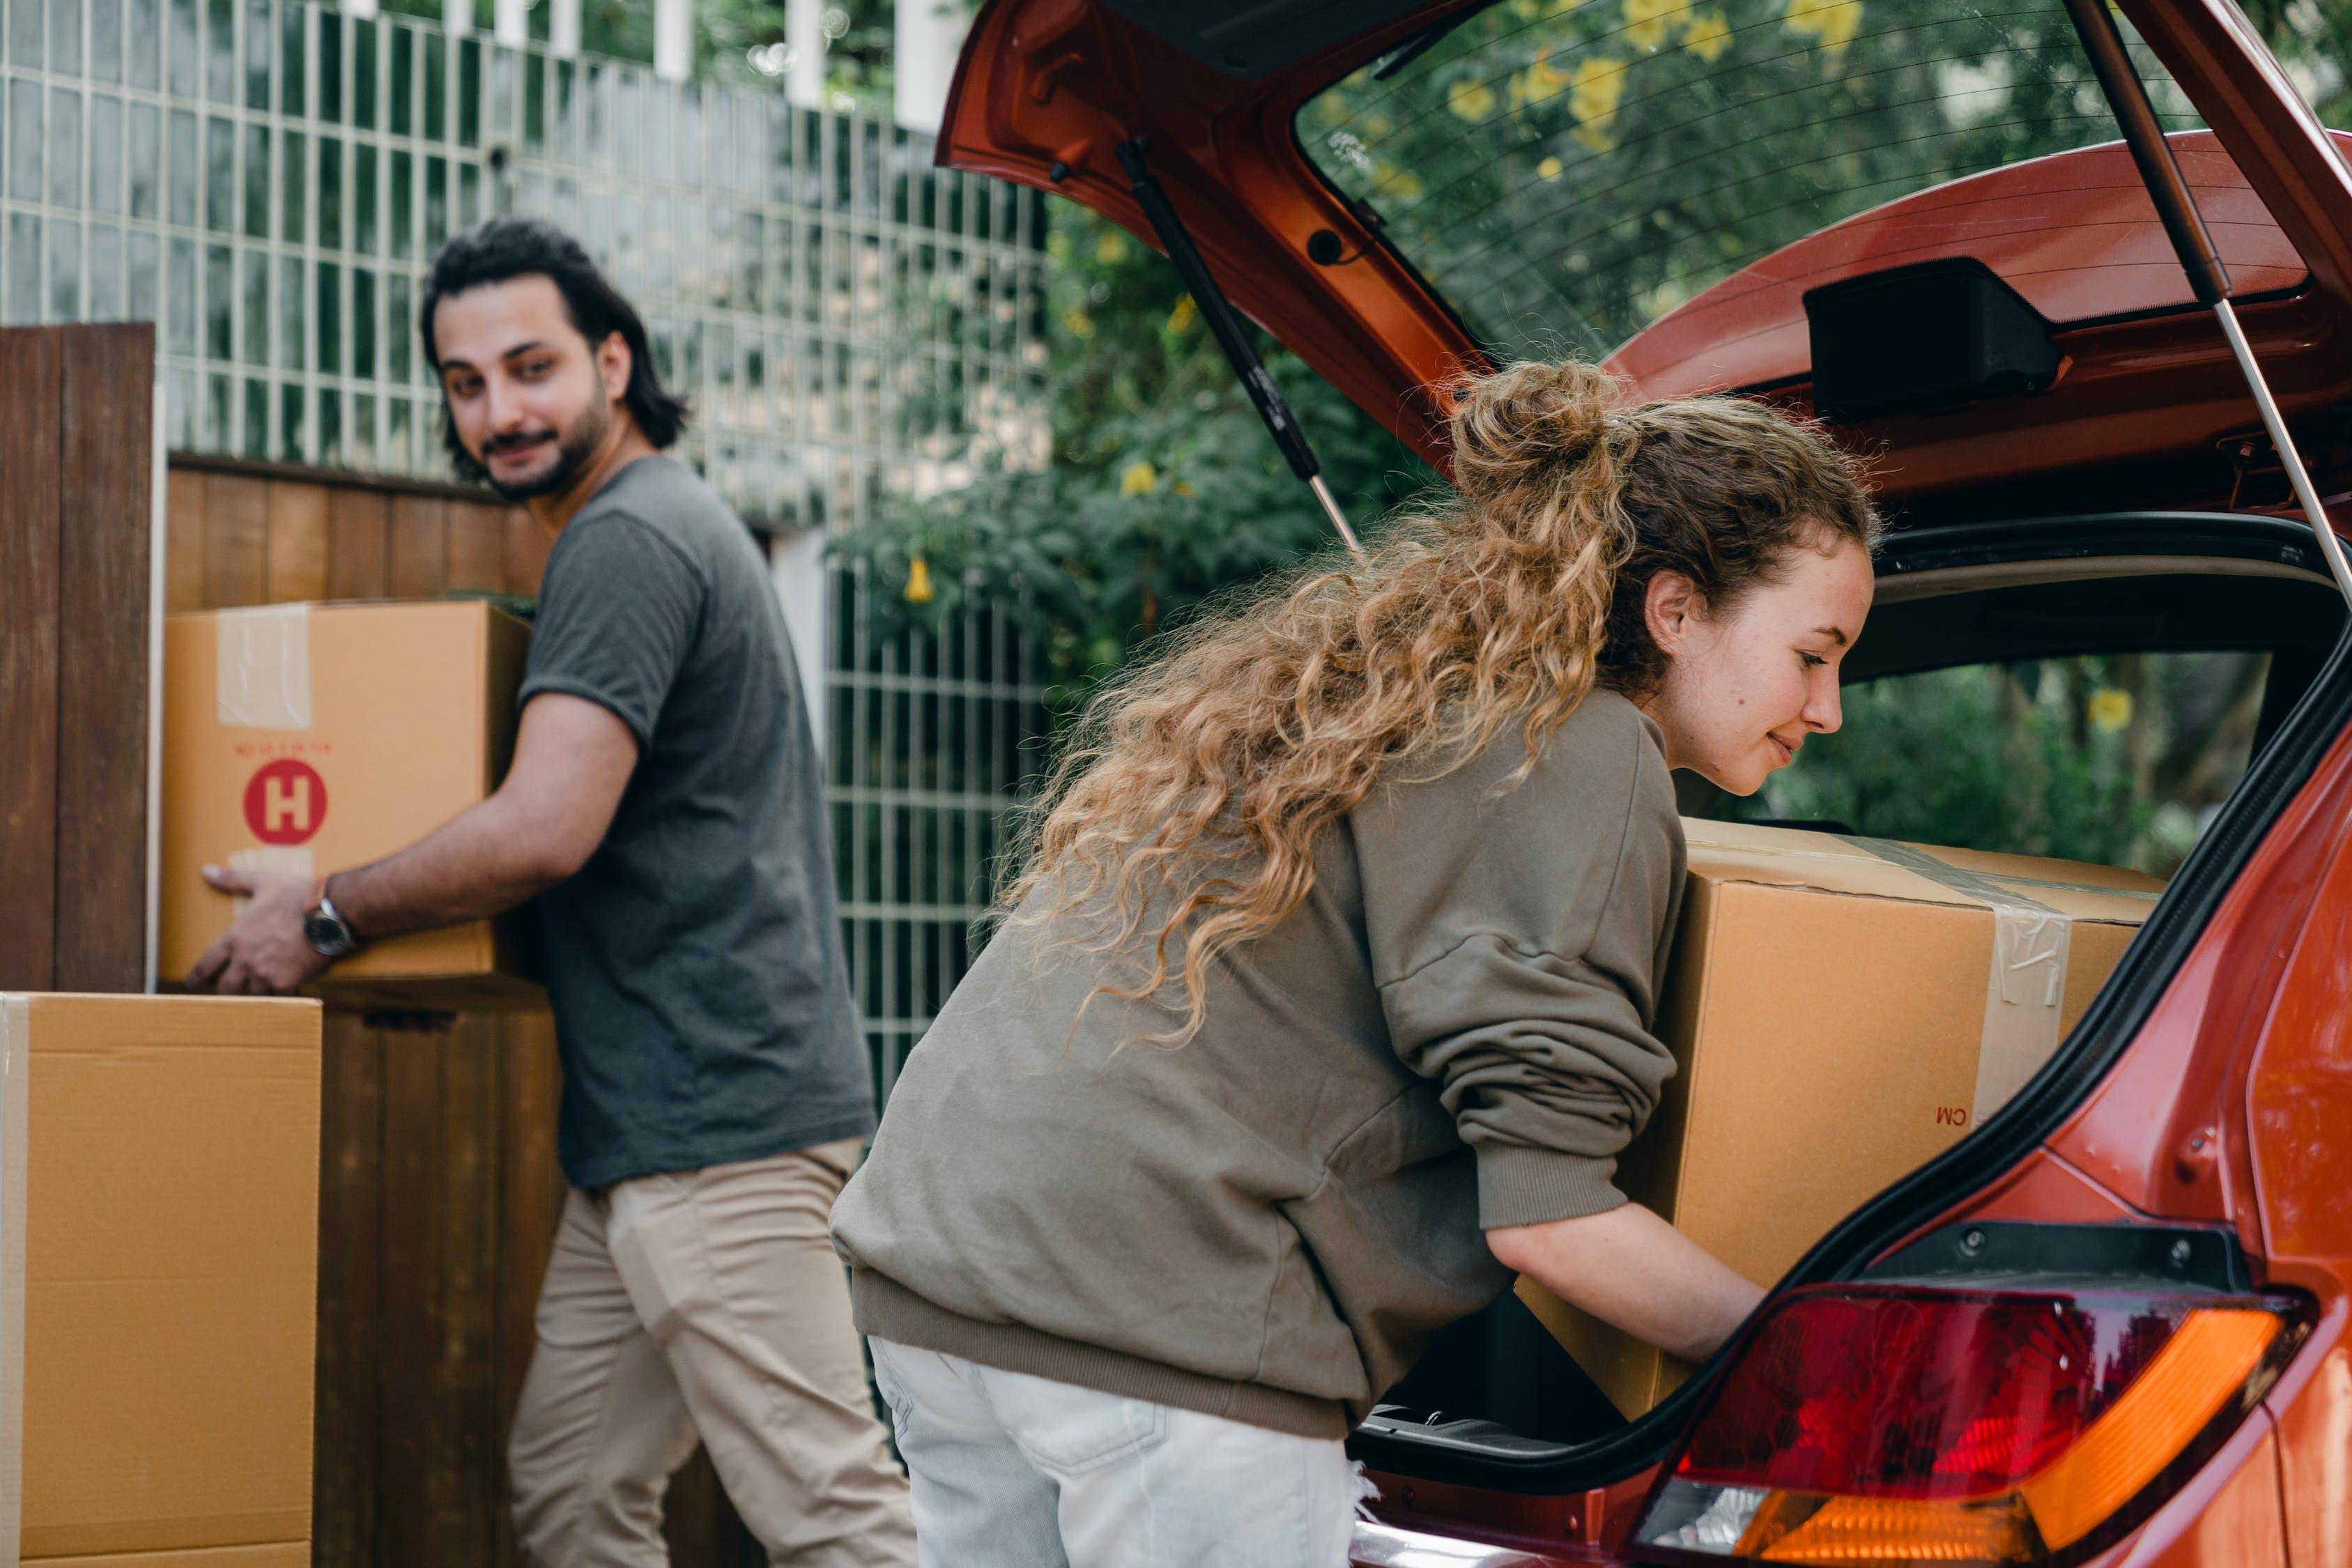 shopping for hybrid vehicle online